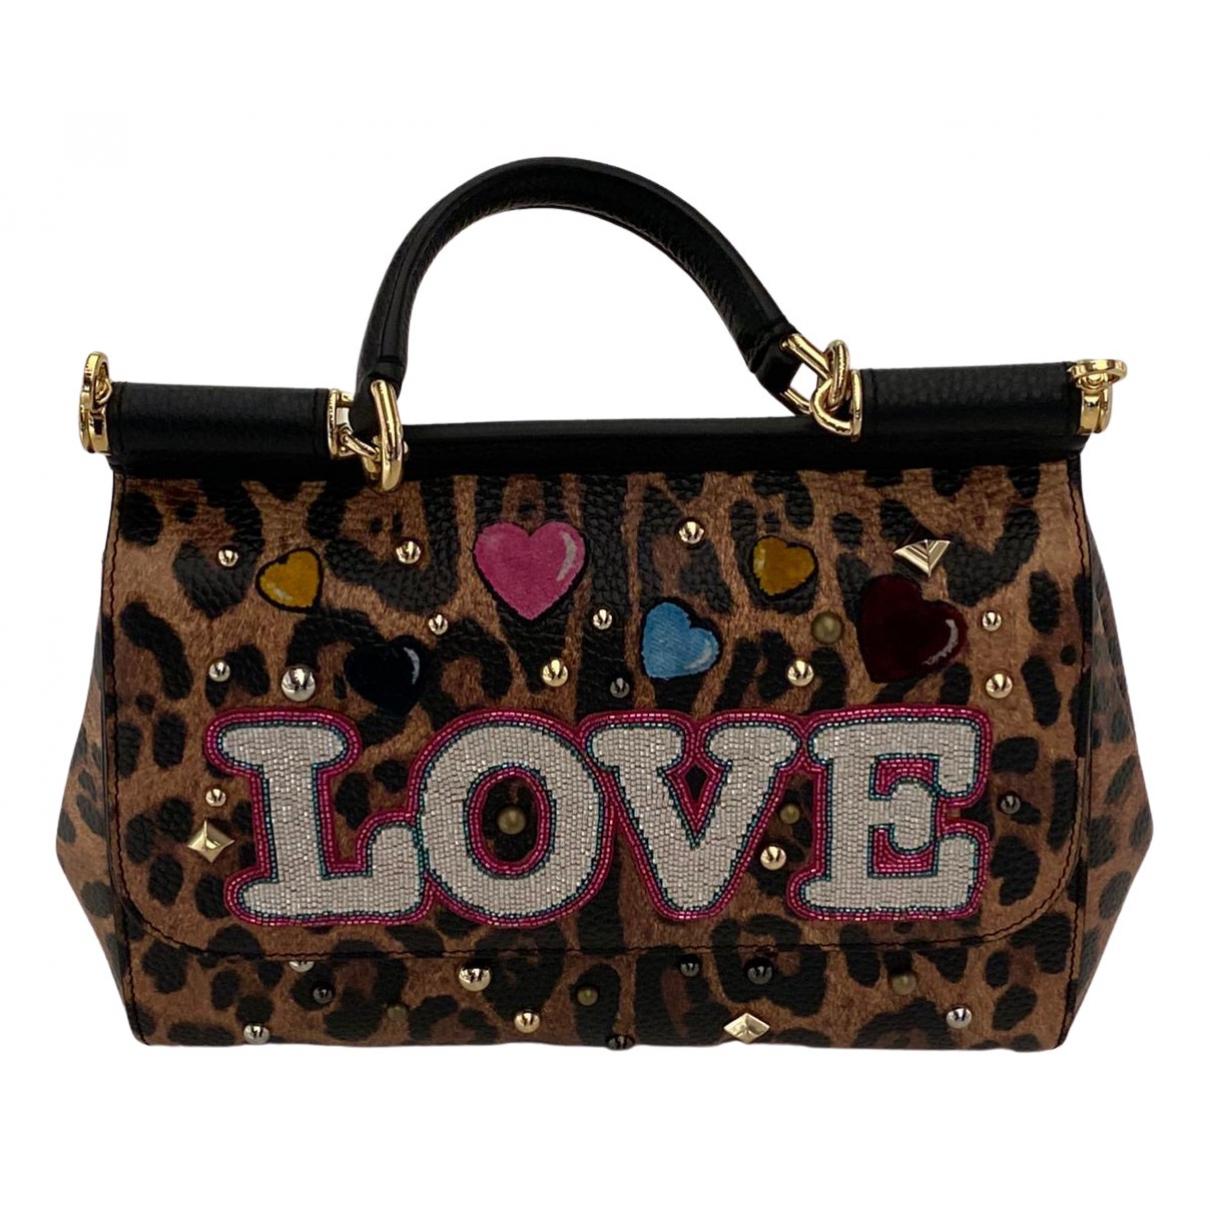 Dolce & Gabbana Sicily Brown Leather handbag for Women \N